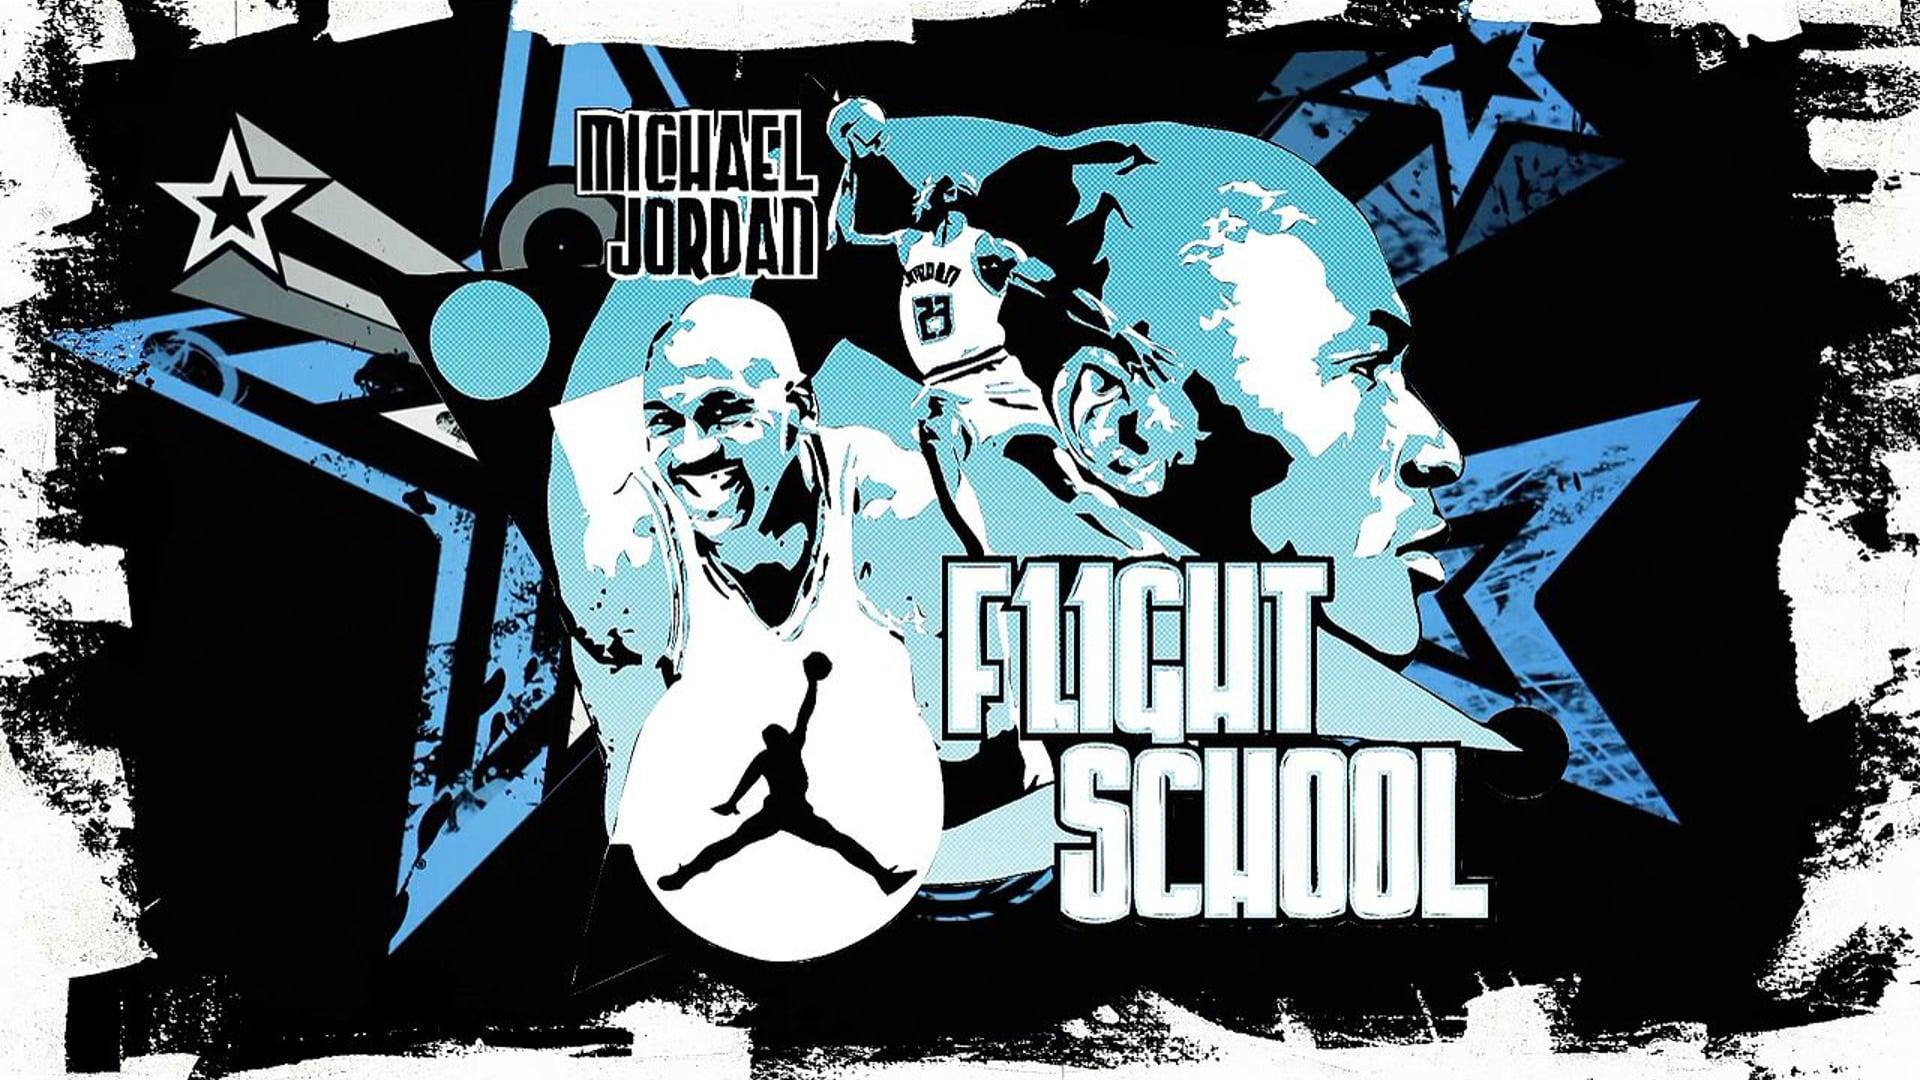 Michael Jordan Flight School (Promotional Featurette)